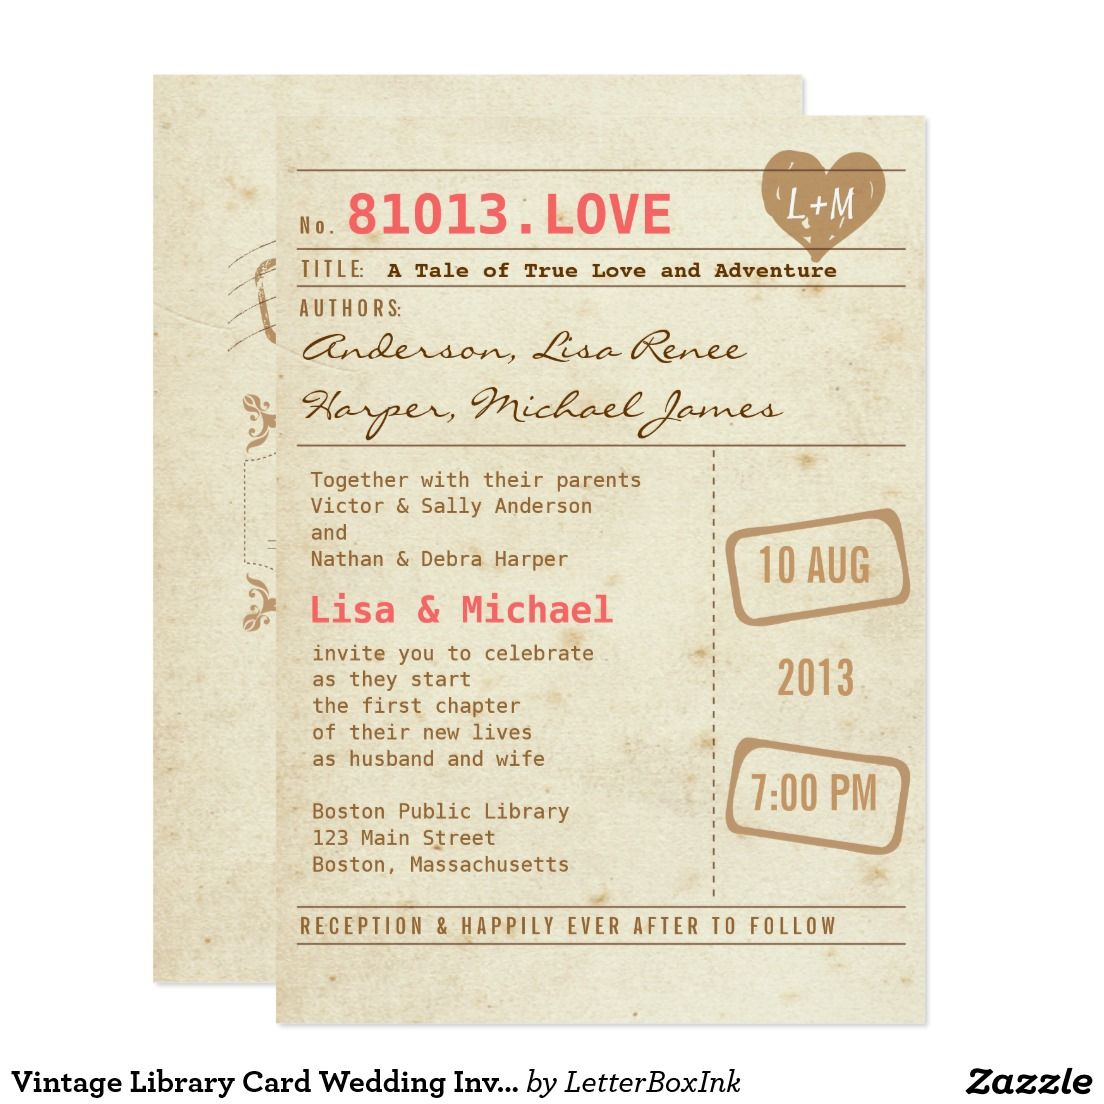 Vintage Library Card Wedding Invitation | Wedding Ideas for Jones ...